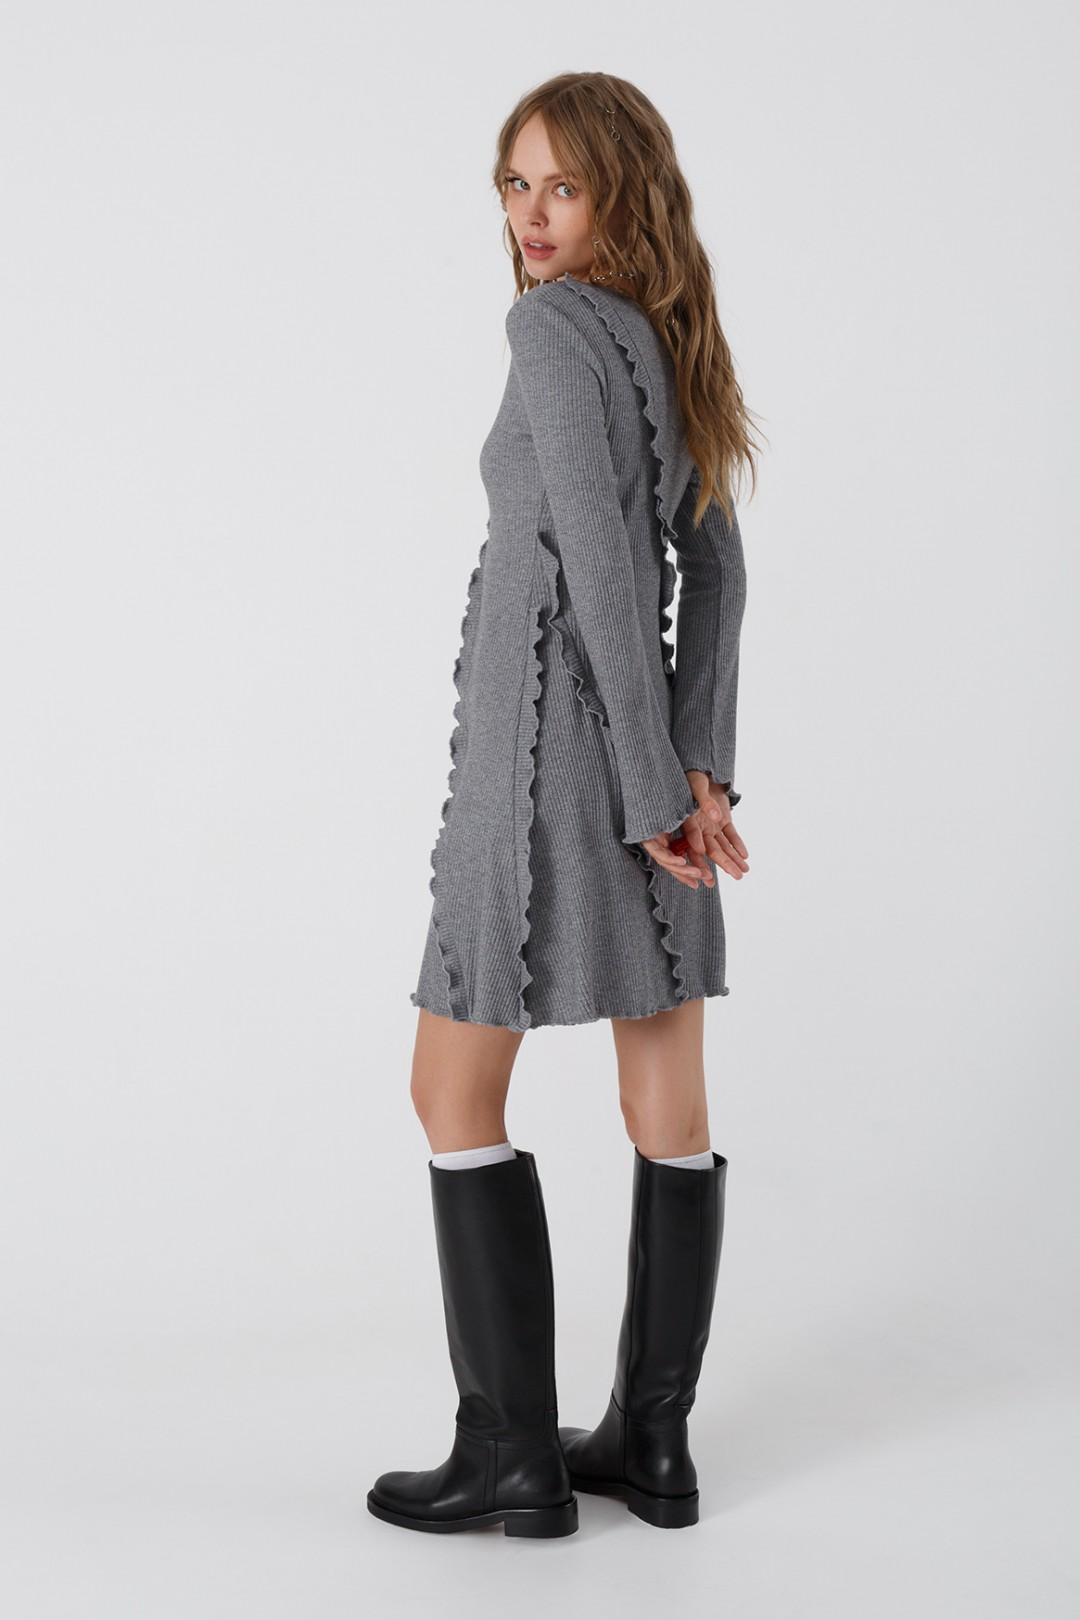 Мини-платье Pirs 3438 серый